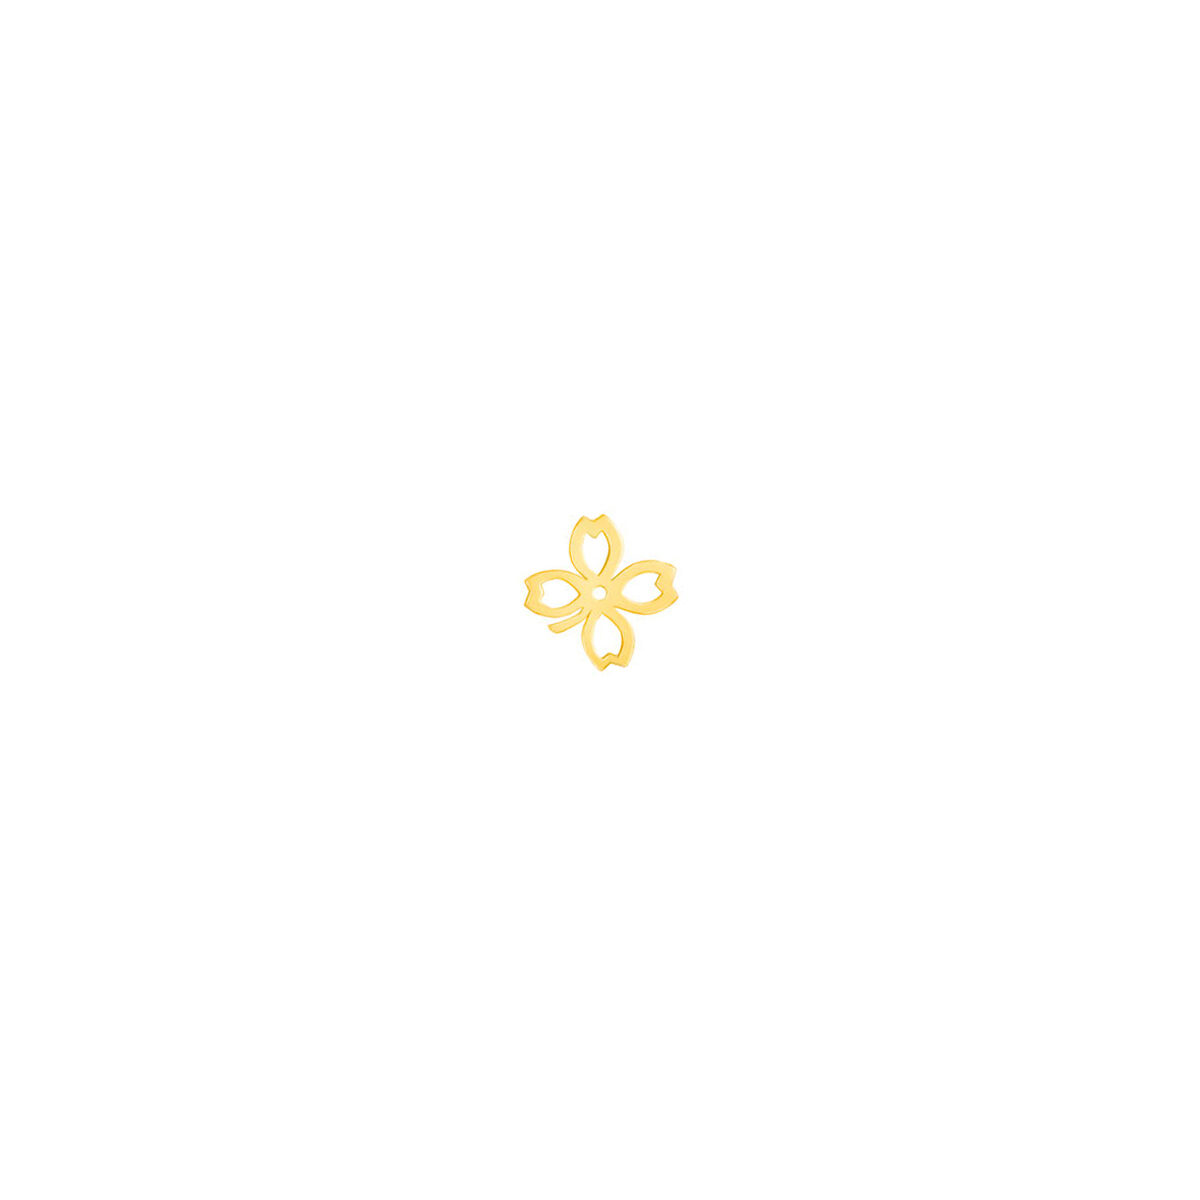 گوشواره طلا تک لنگه ای شبدر